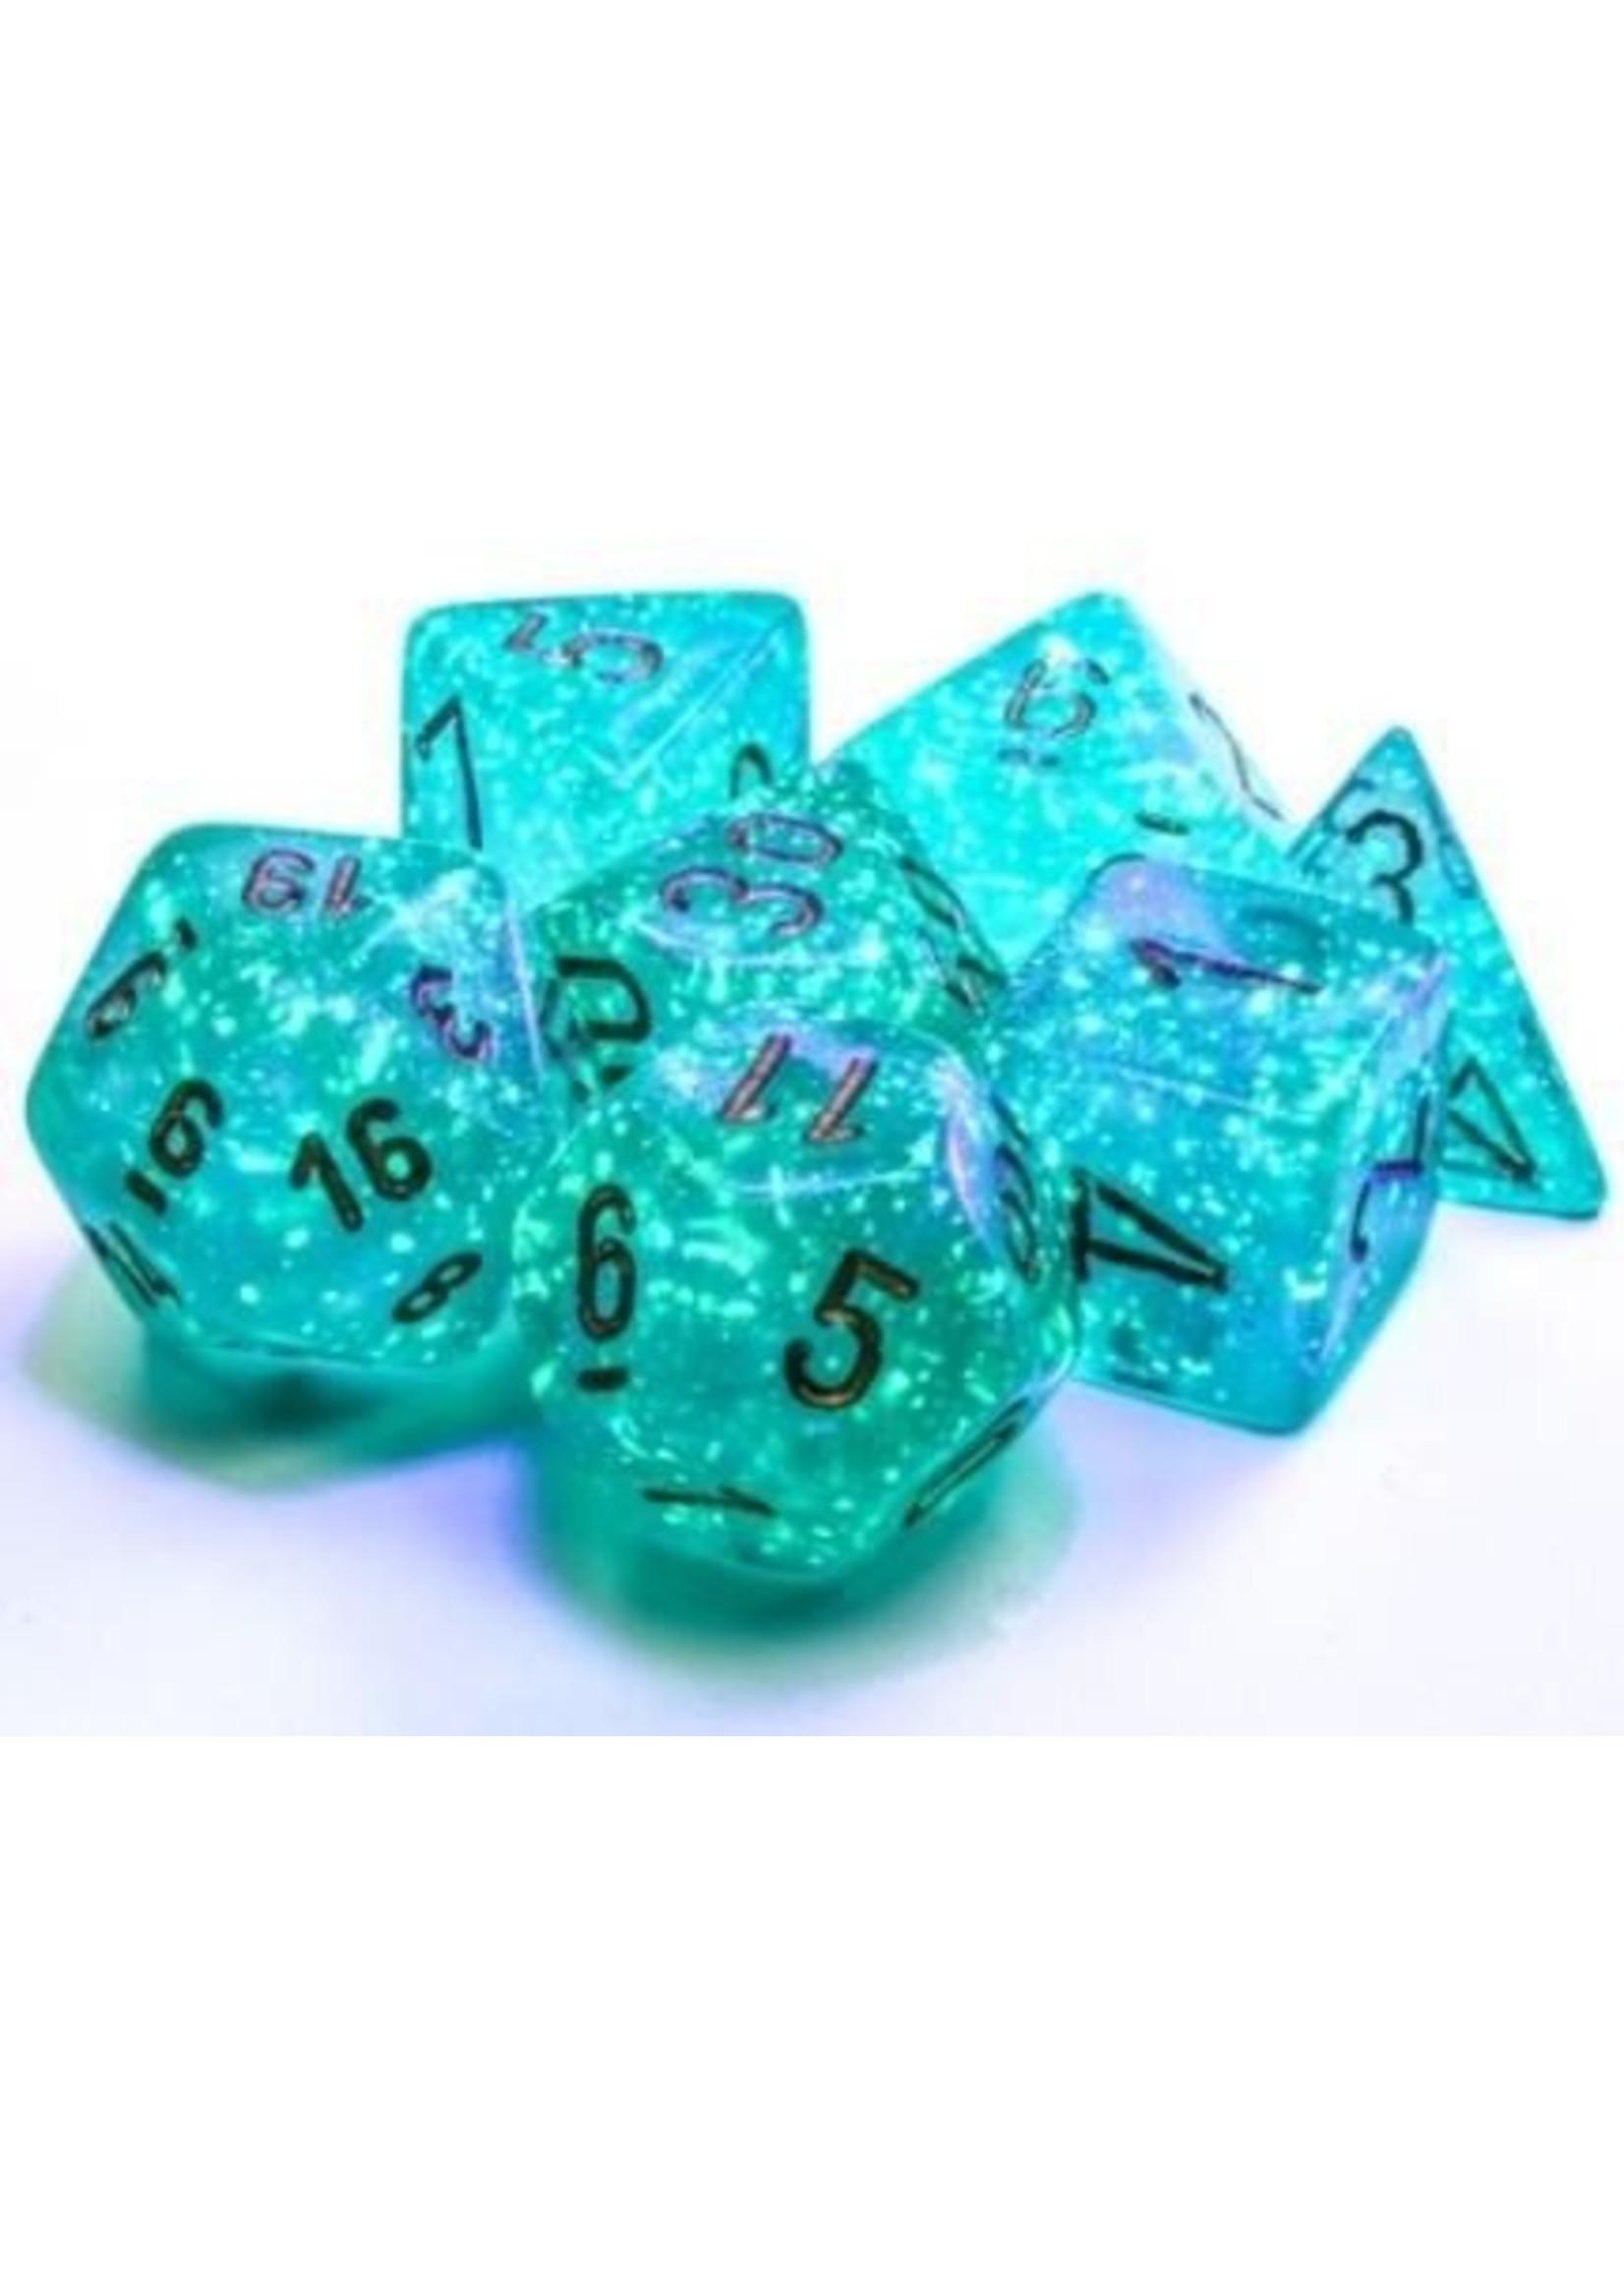 Borealis: Polyhedral Teal/gold Luminary 7-Die Set